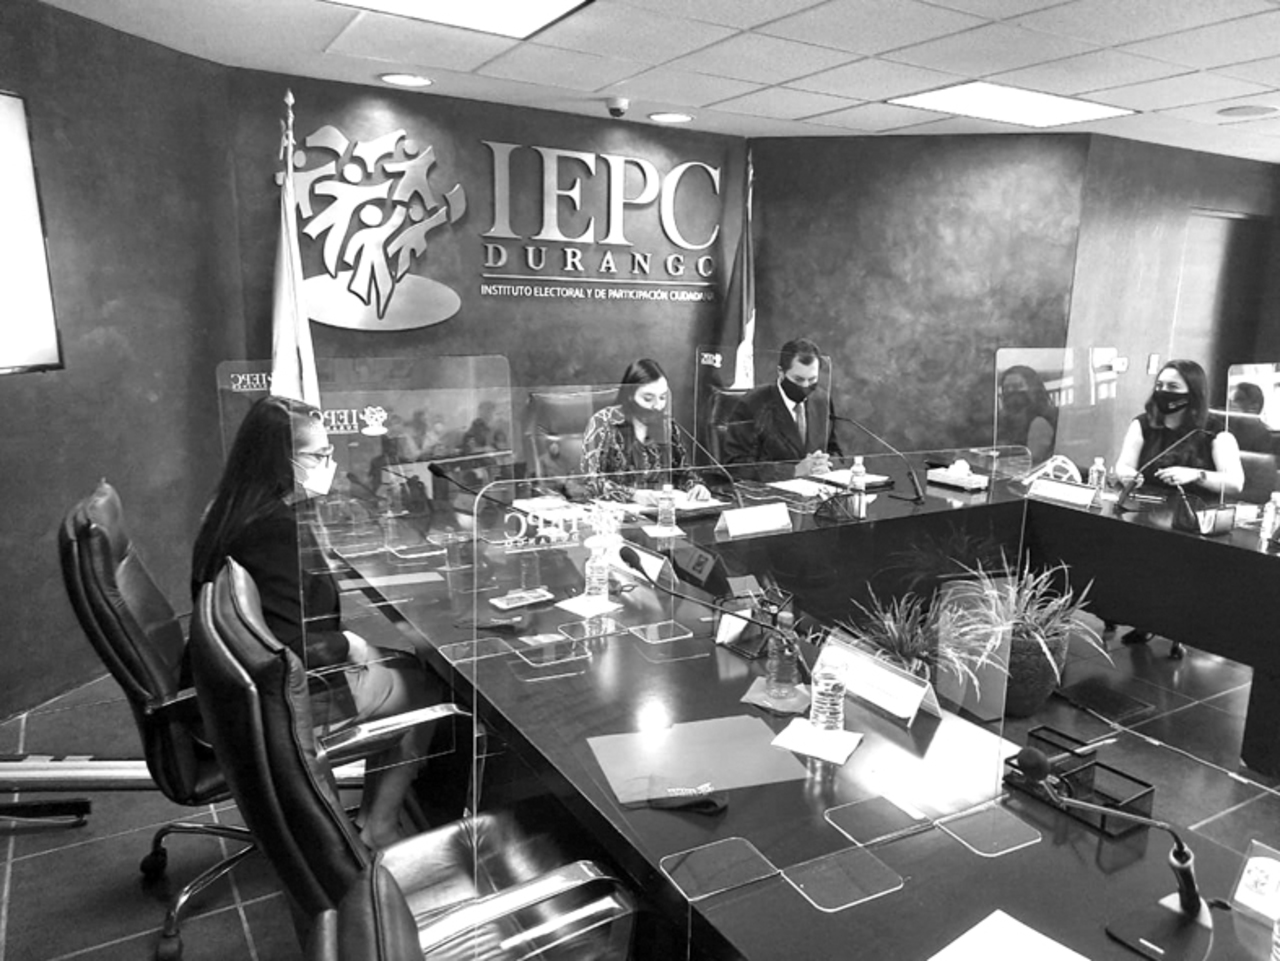 Aspirantes deben acatar medidas: IEPC